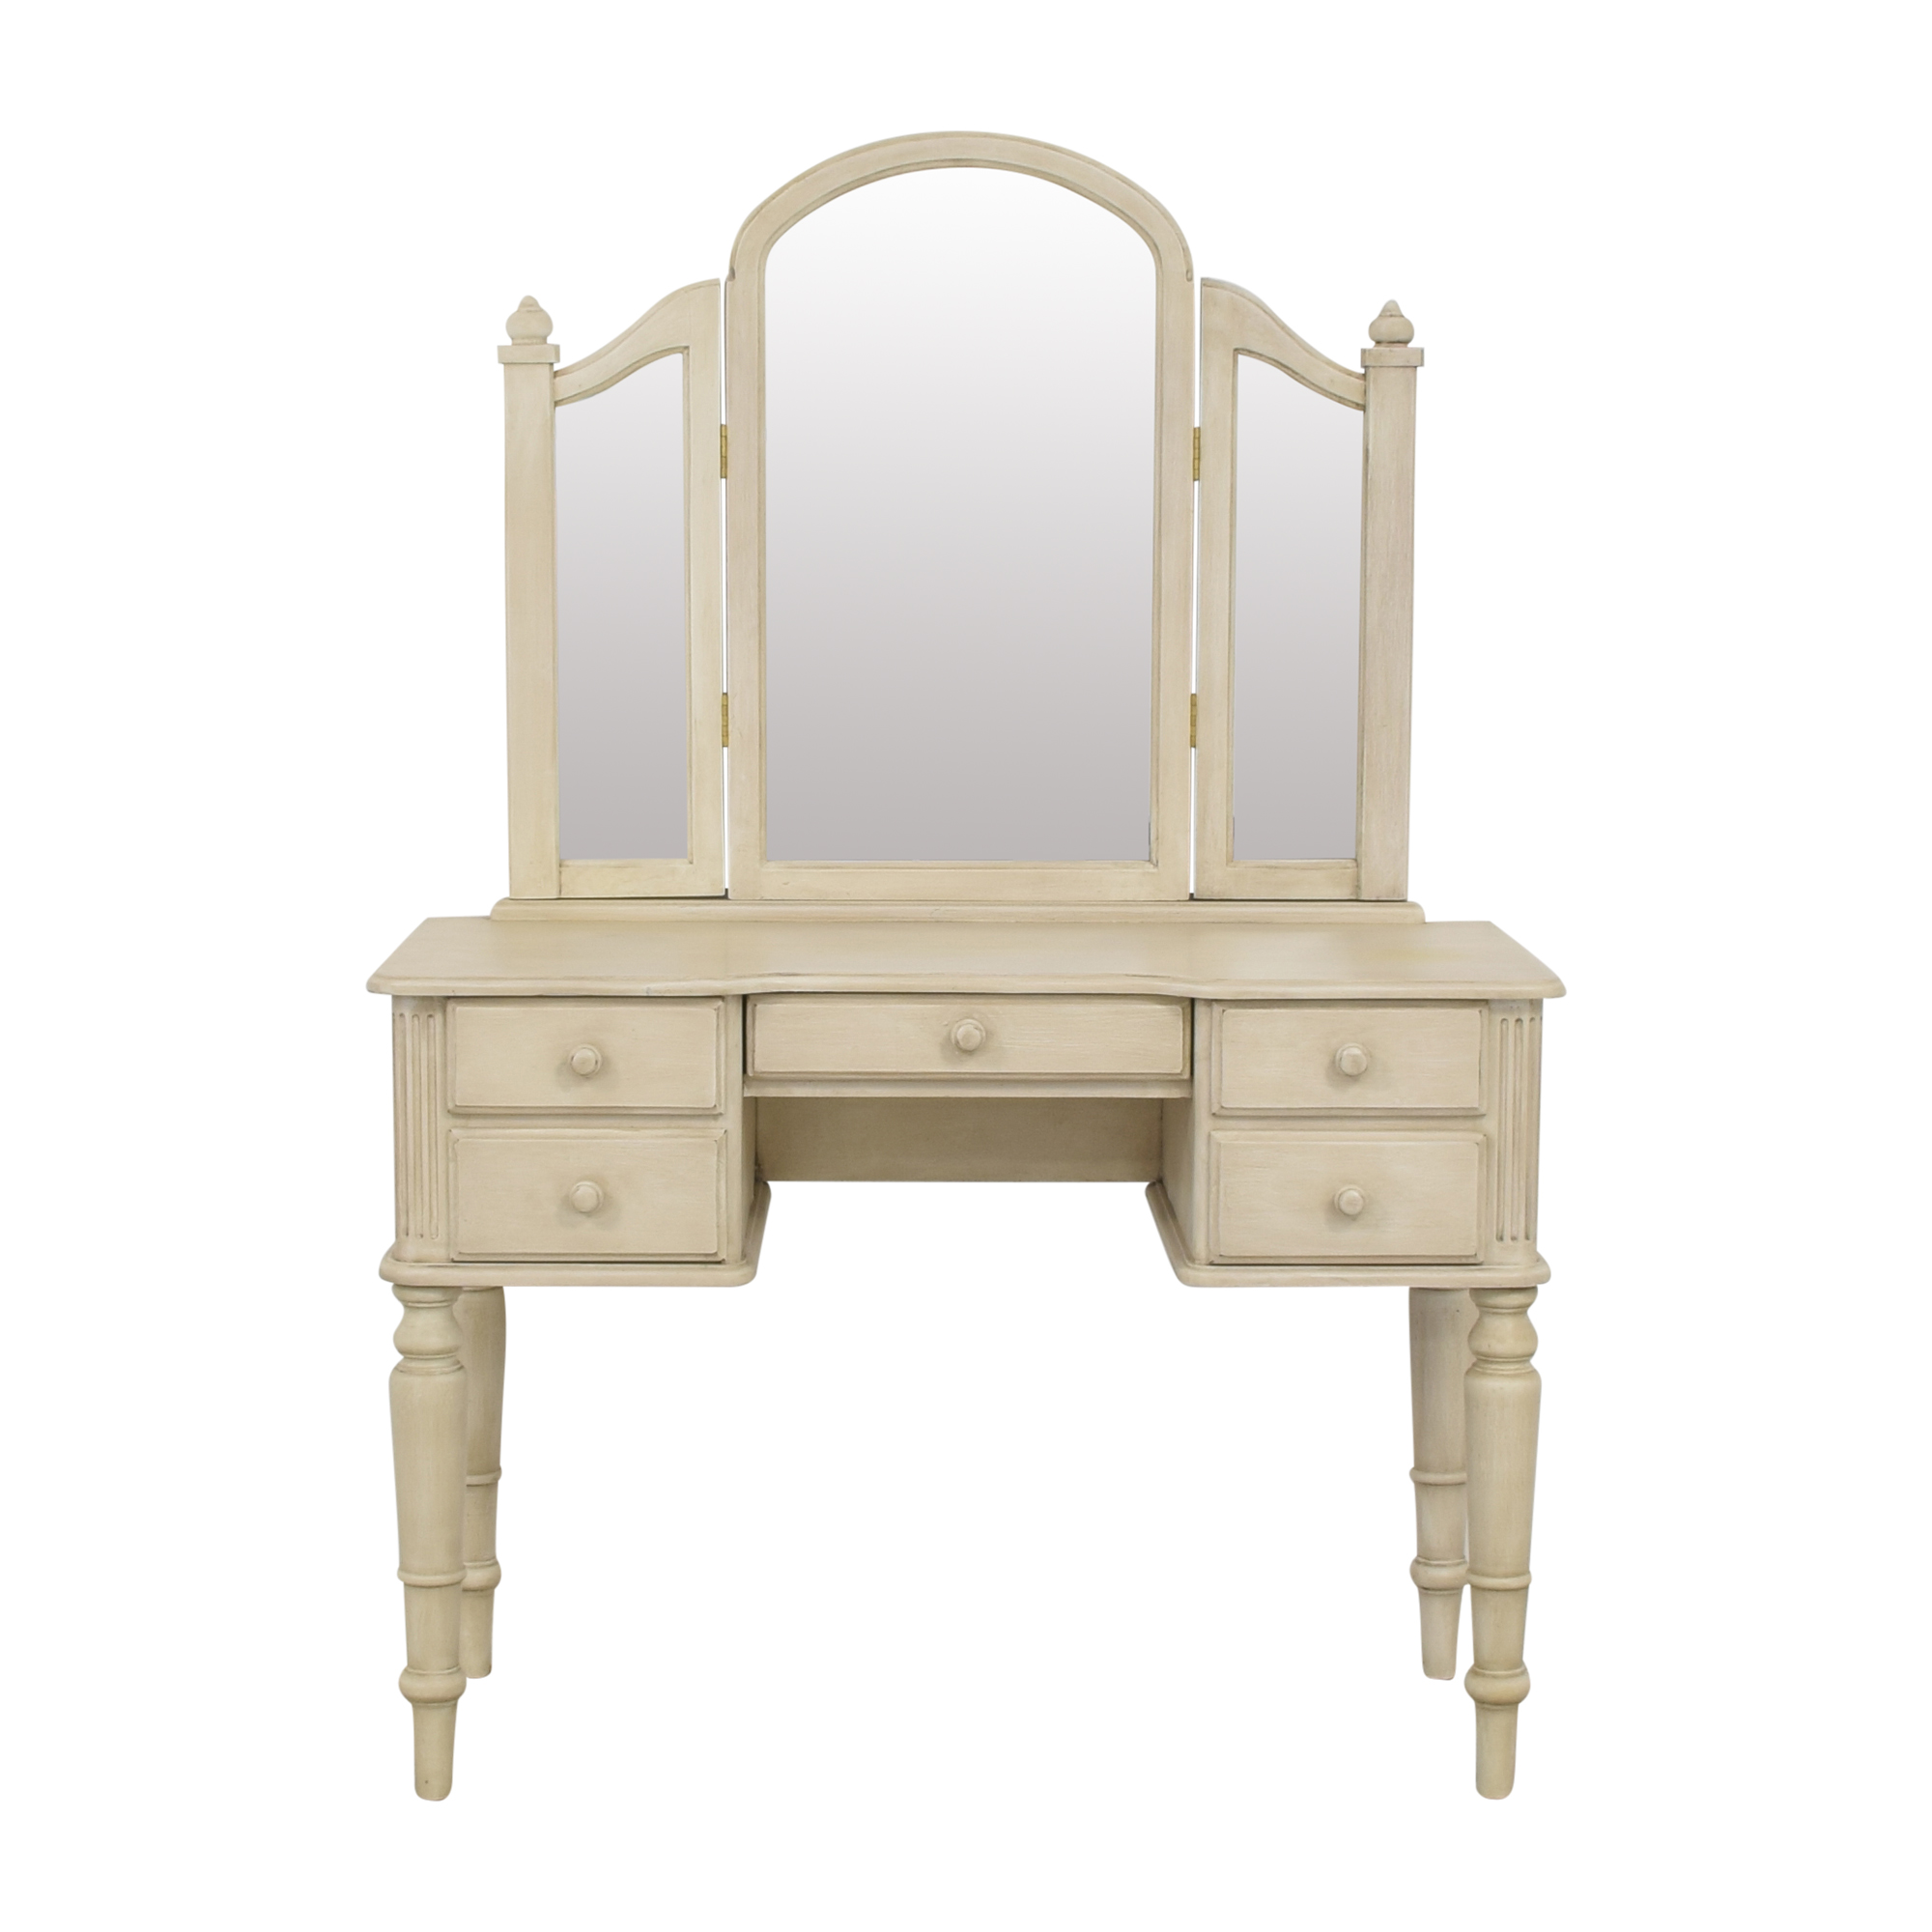 Ethan Allen Ethan Allen Vanity with Tri-Fold Mirror pa